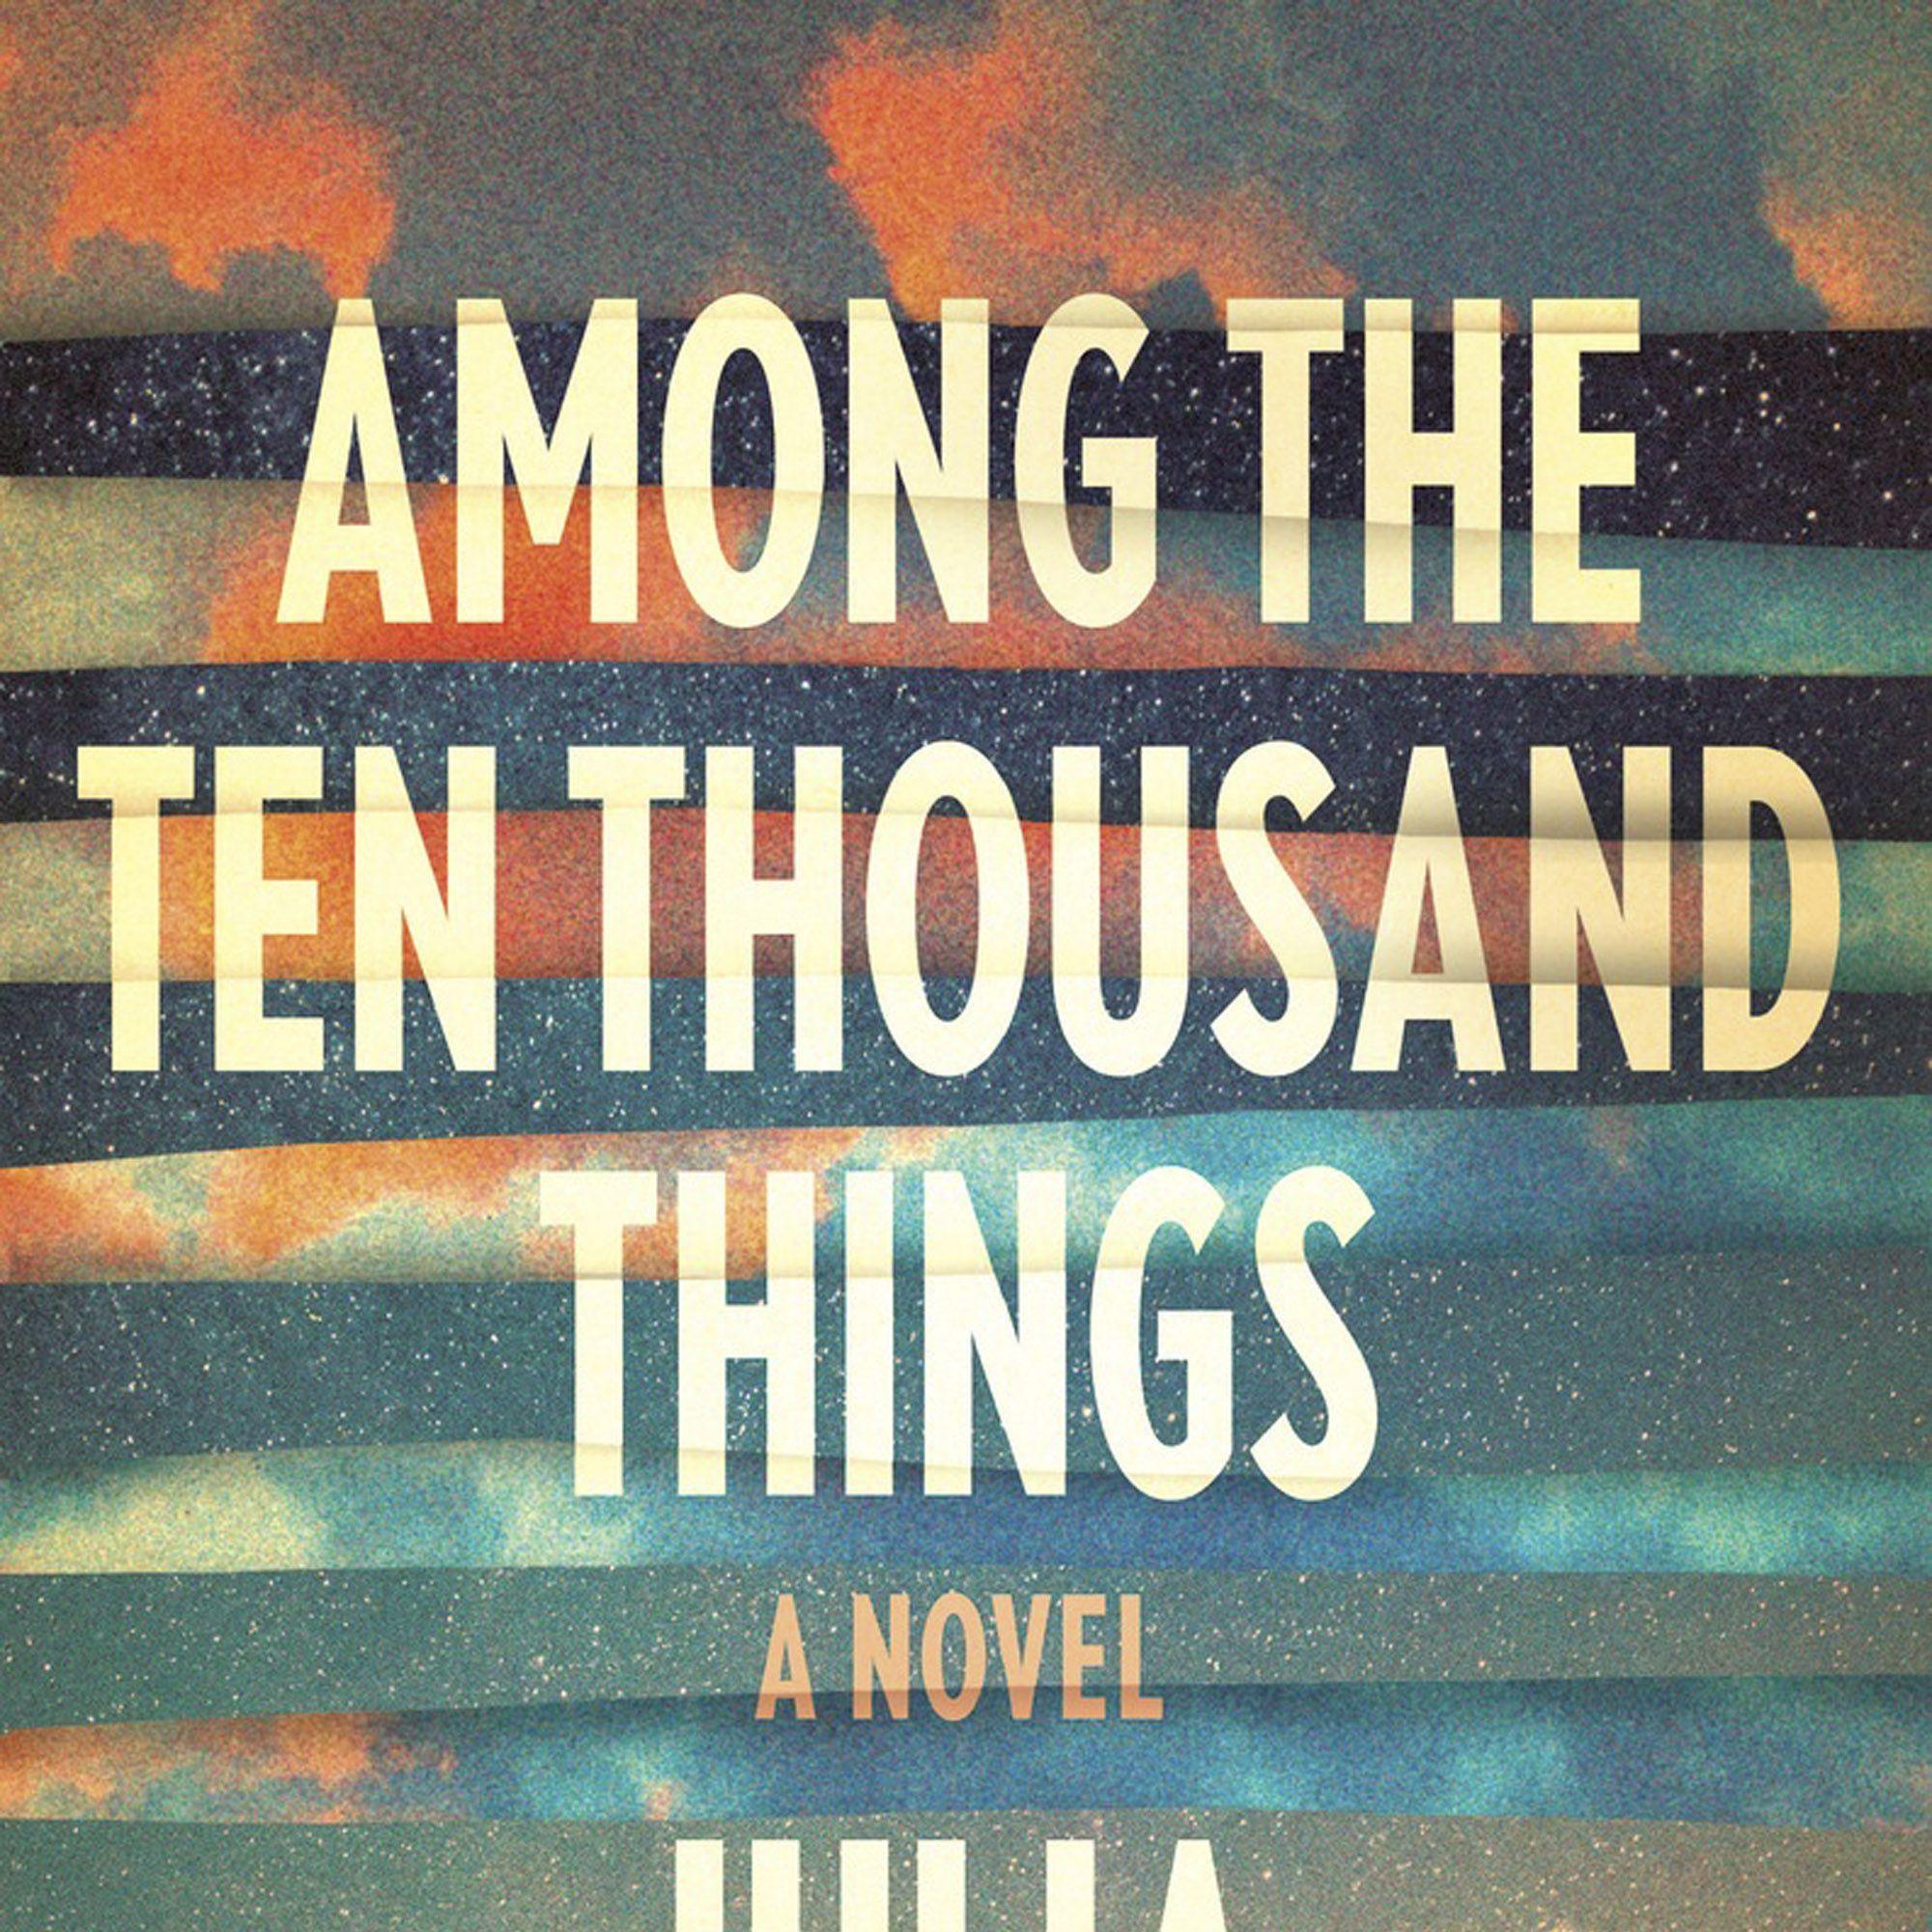 "<p><em>Among The Ten Thousand Things</em> by Julia Pierpont, $18, <a href=""http://www.amazon.com/Among-Ten-Thousand-Things-Novel/dp/0812995228"" target=""_blank"">amazon.com</a>. </p>"